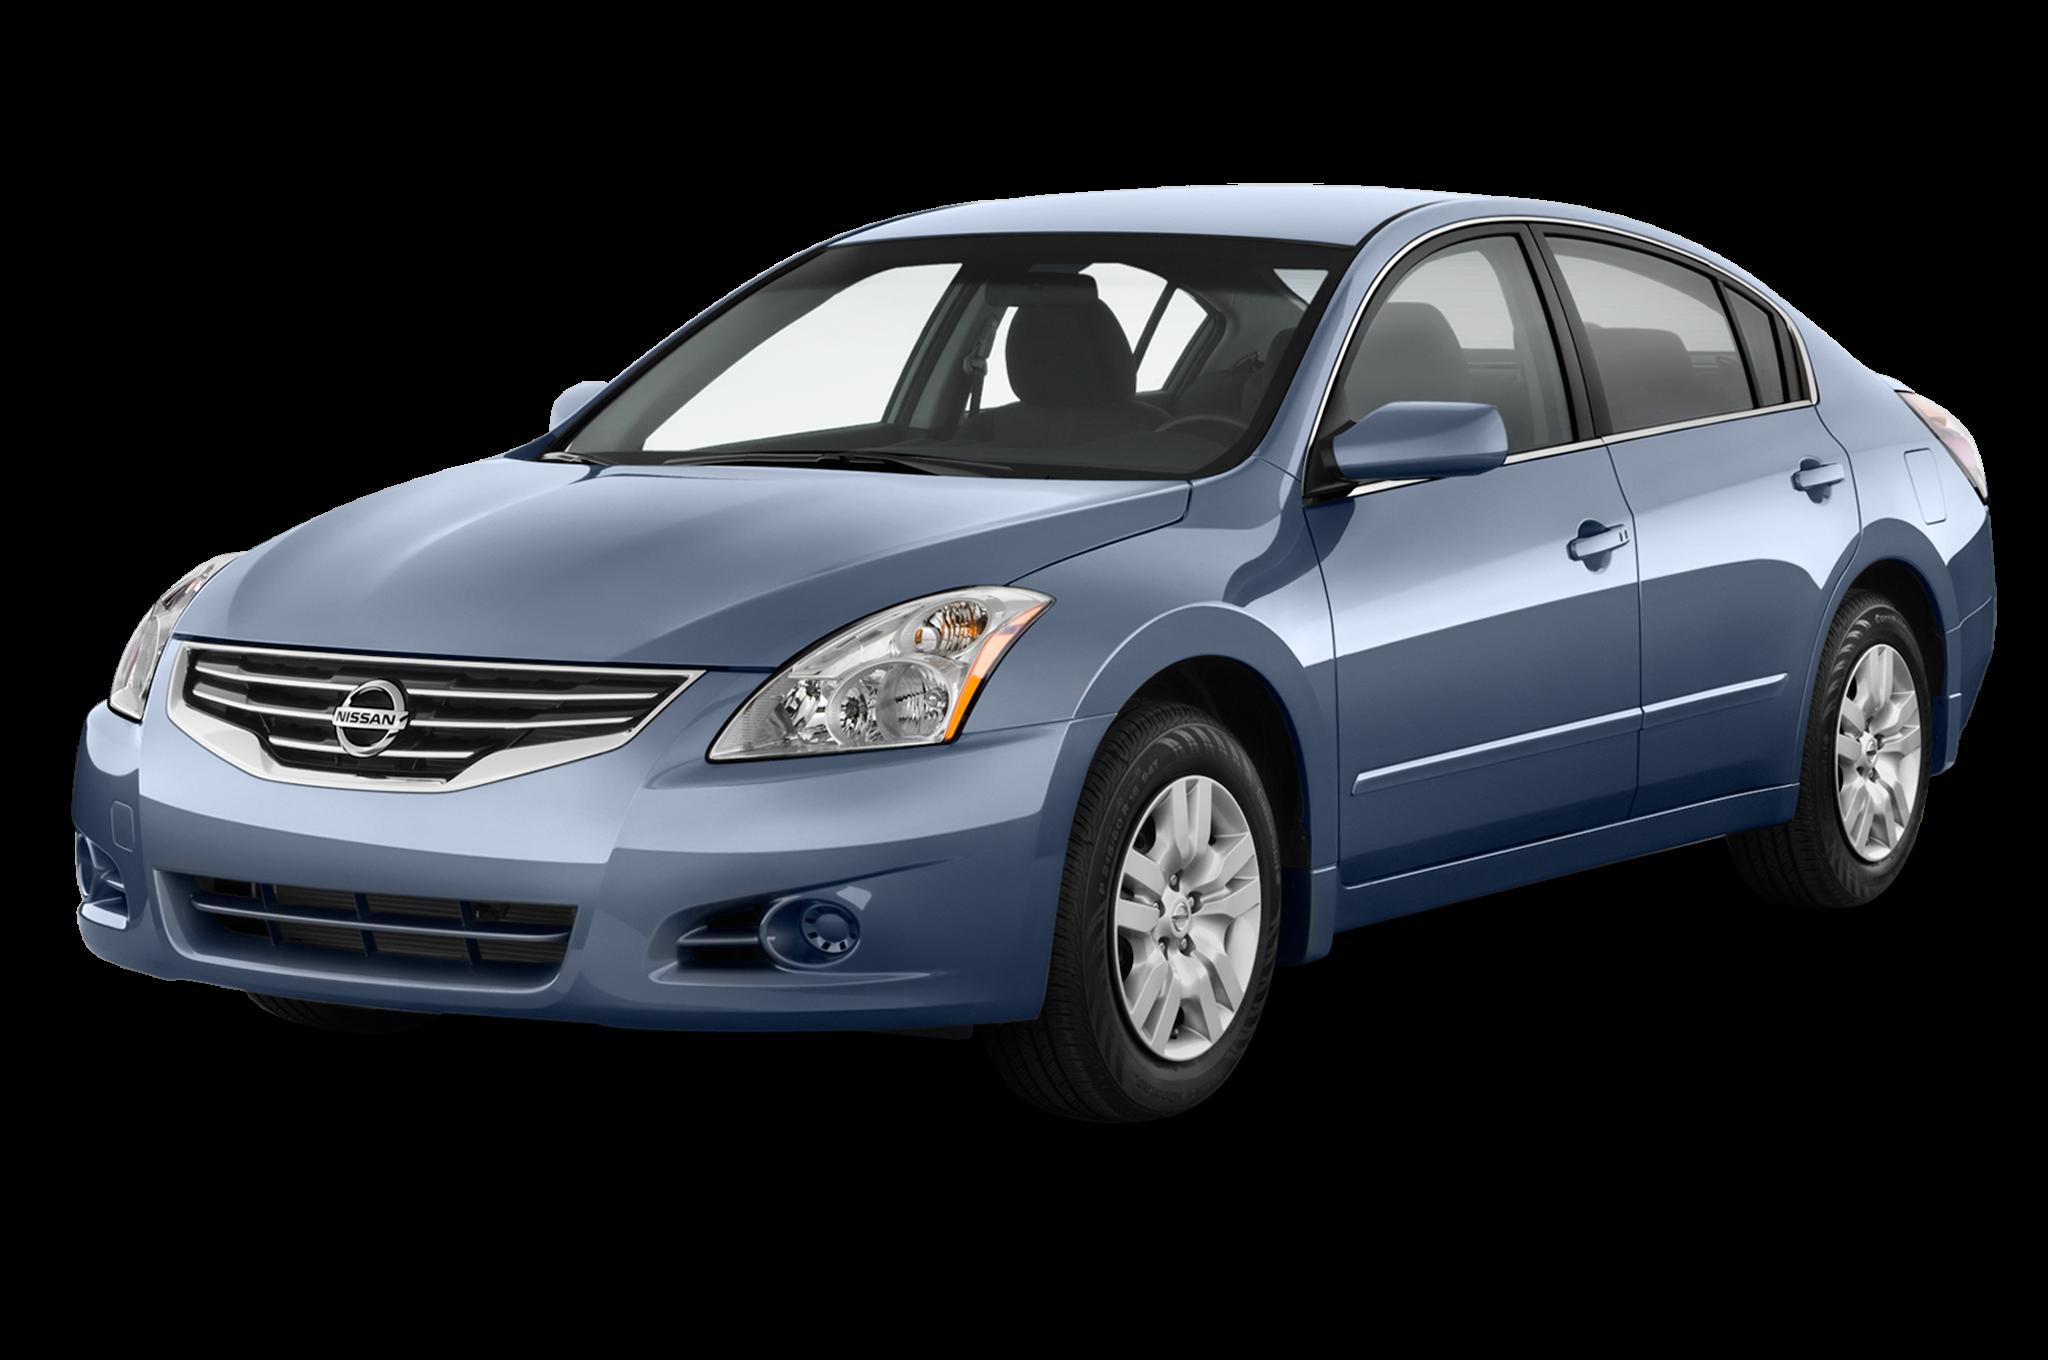 Nissan ALTIMA 2.5 S CVT Coupe   2011 ( PRICES U0026 SPECS )